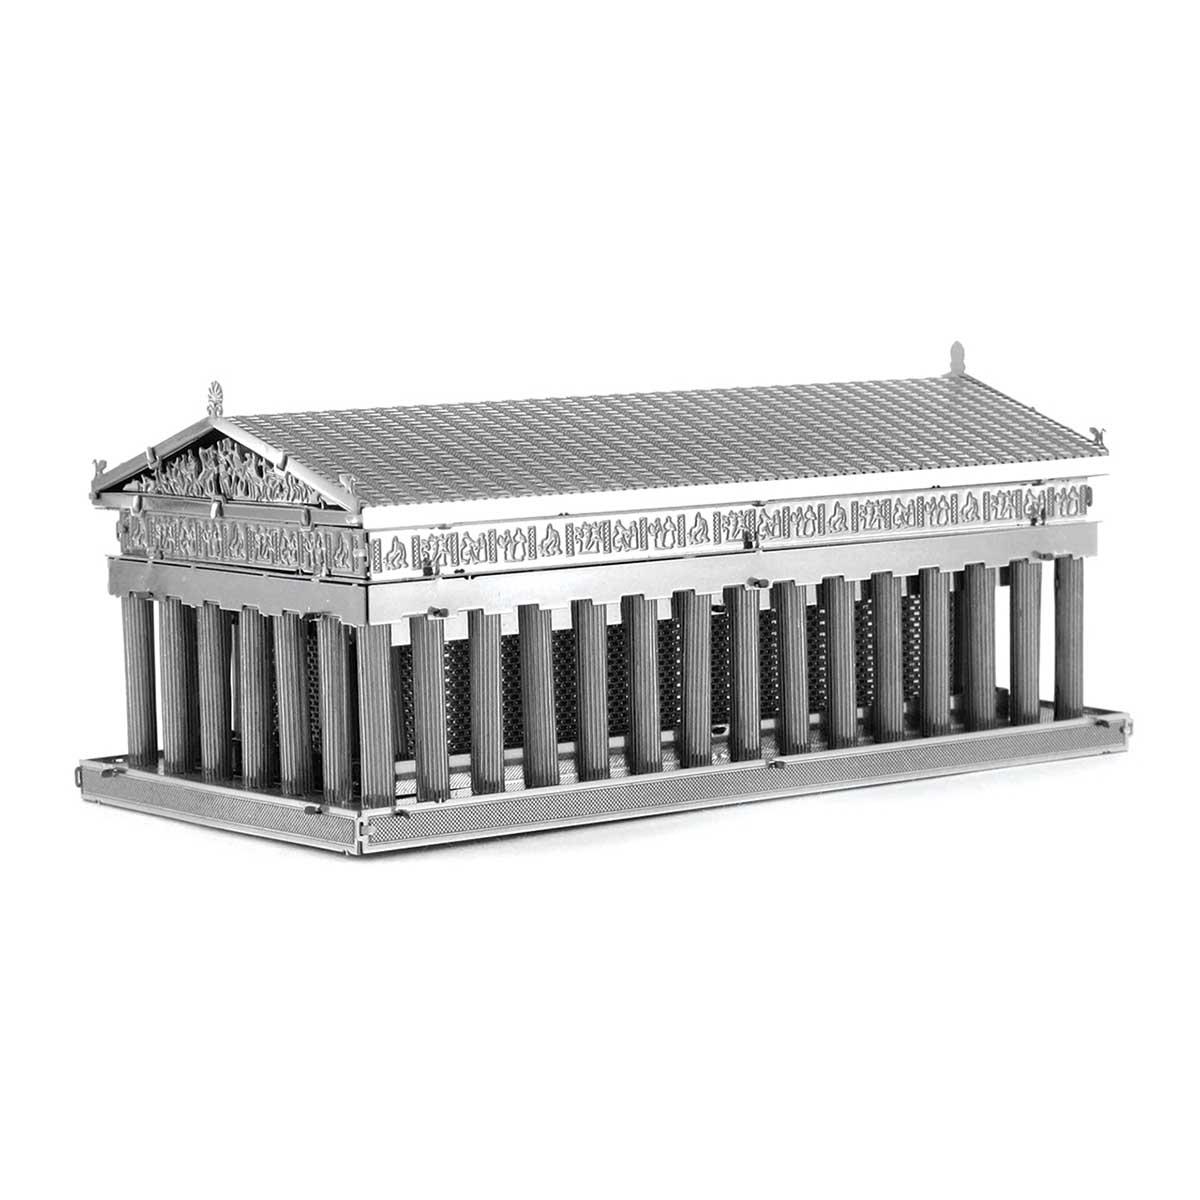 Parthenon Temple Landmarks / Monuments Metal Puzzles